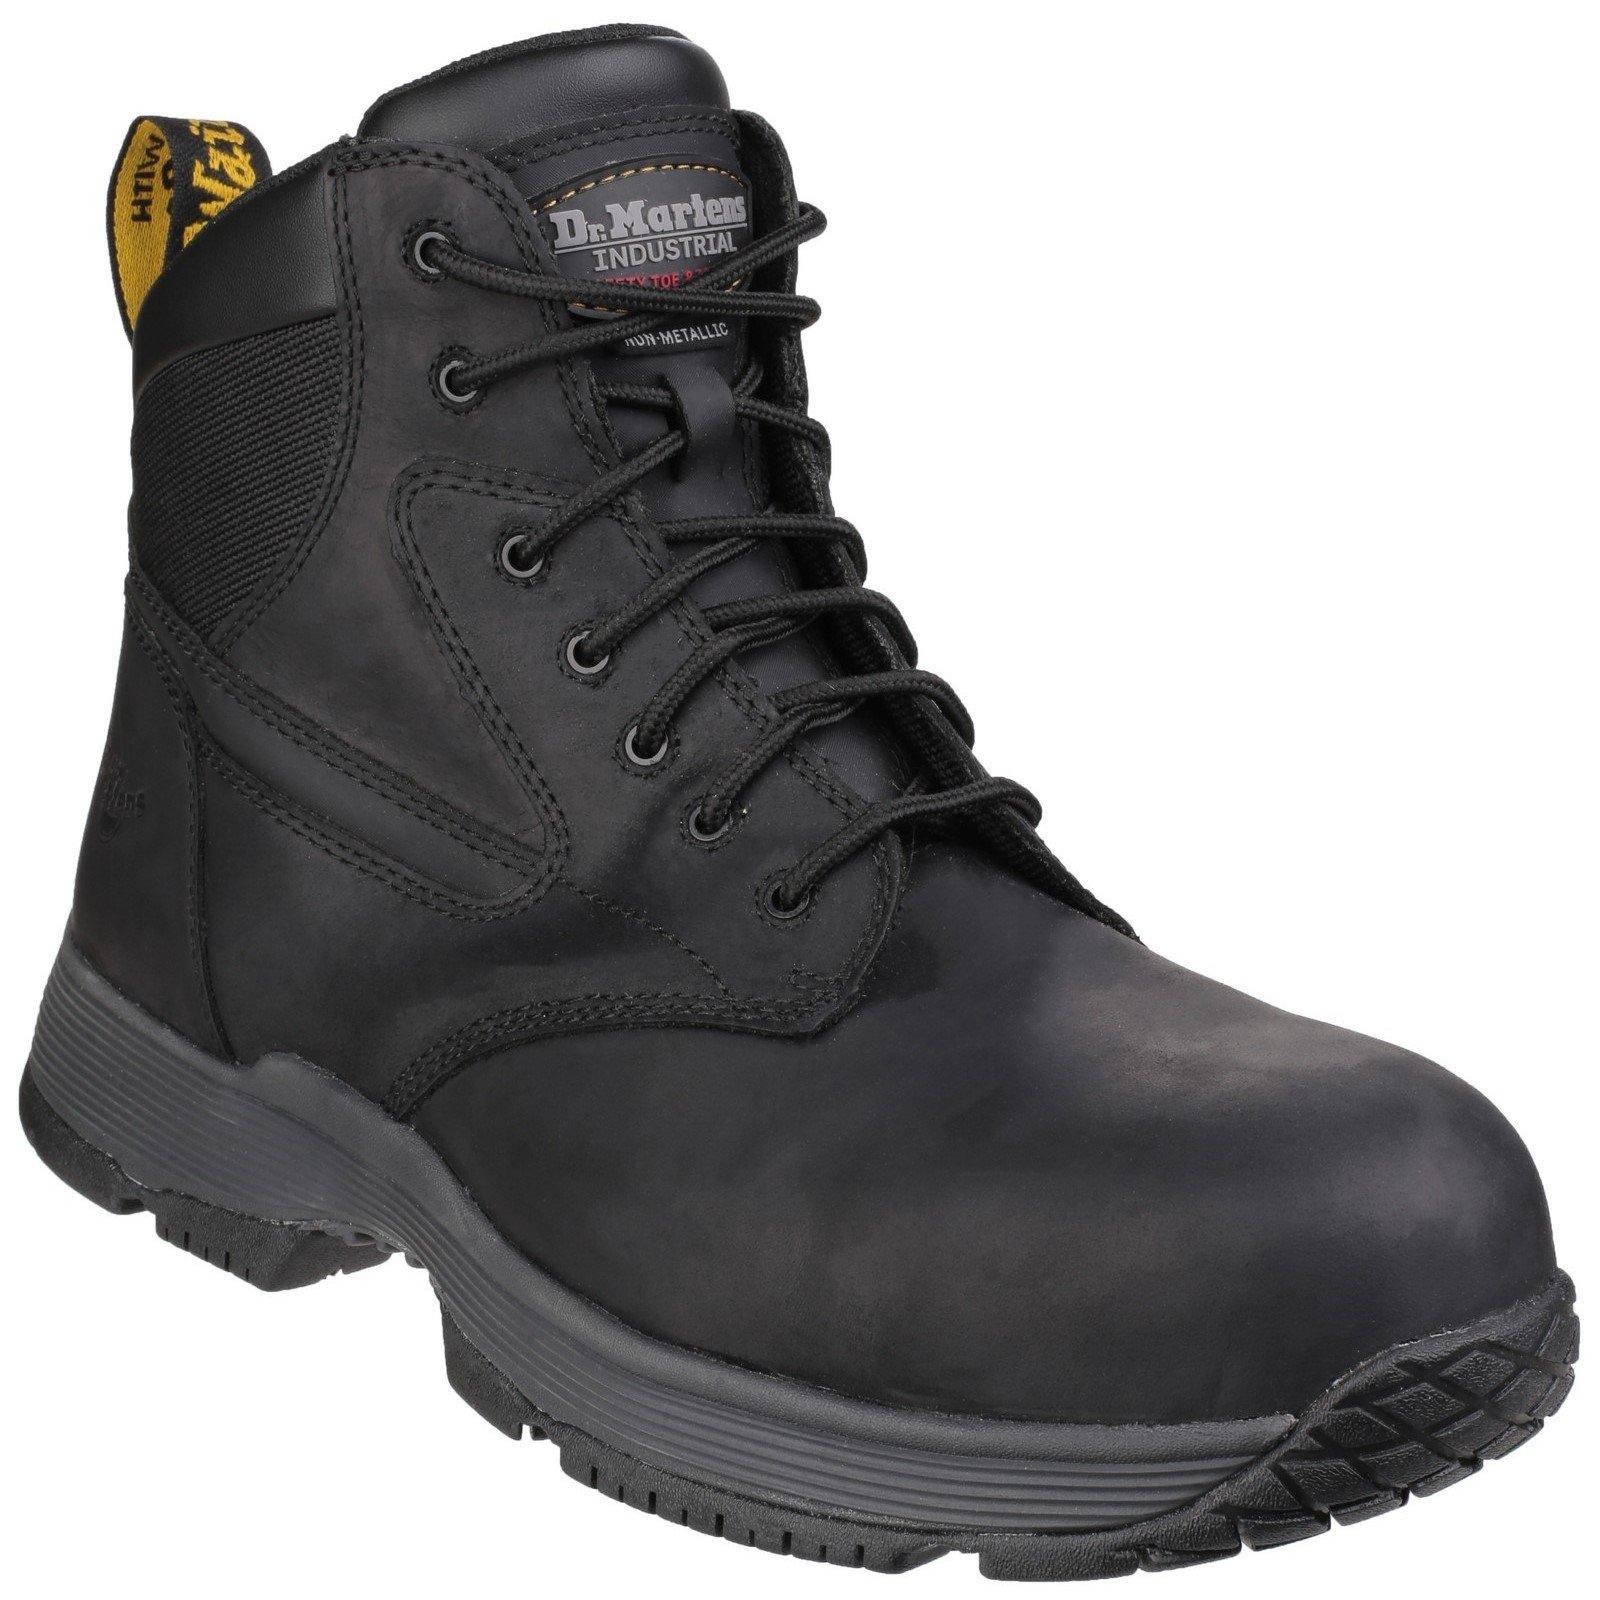 Dr Martens Unisex Corvid Composite Lace up Safety Boot Black 24862-41125 - Black 11